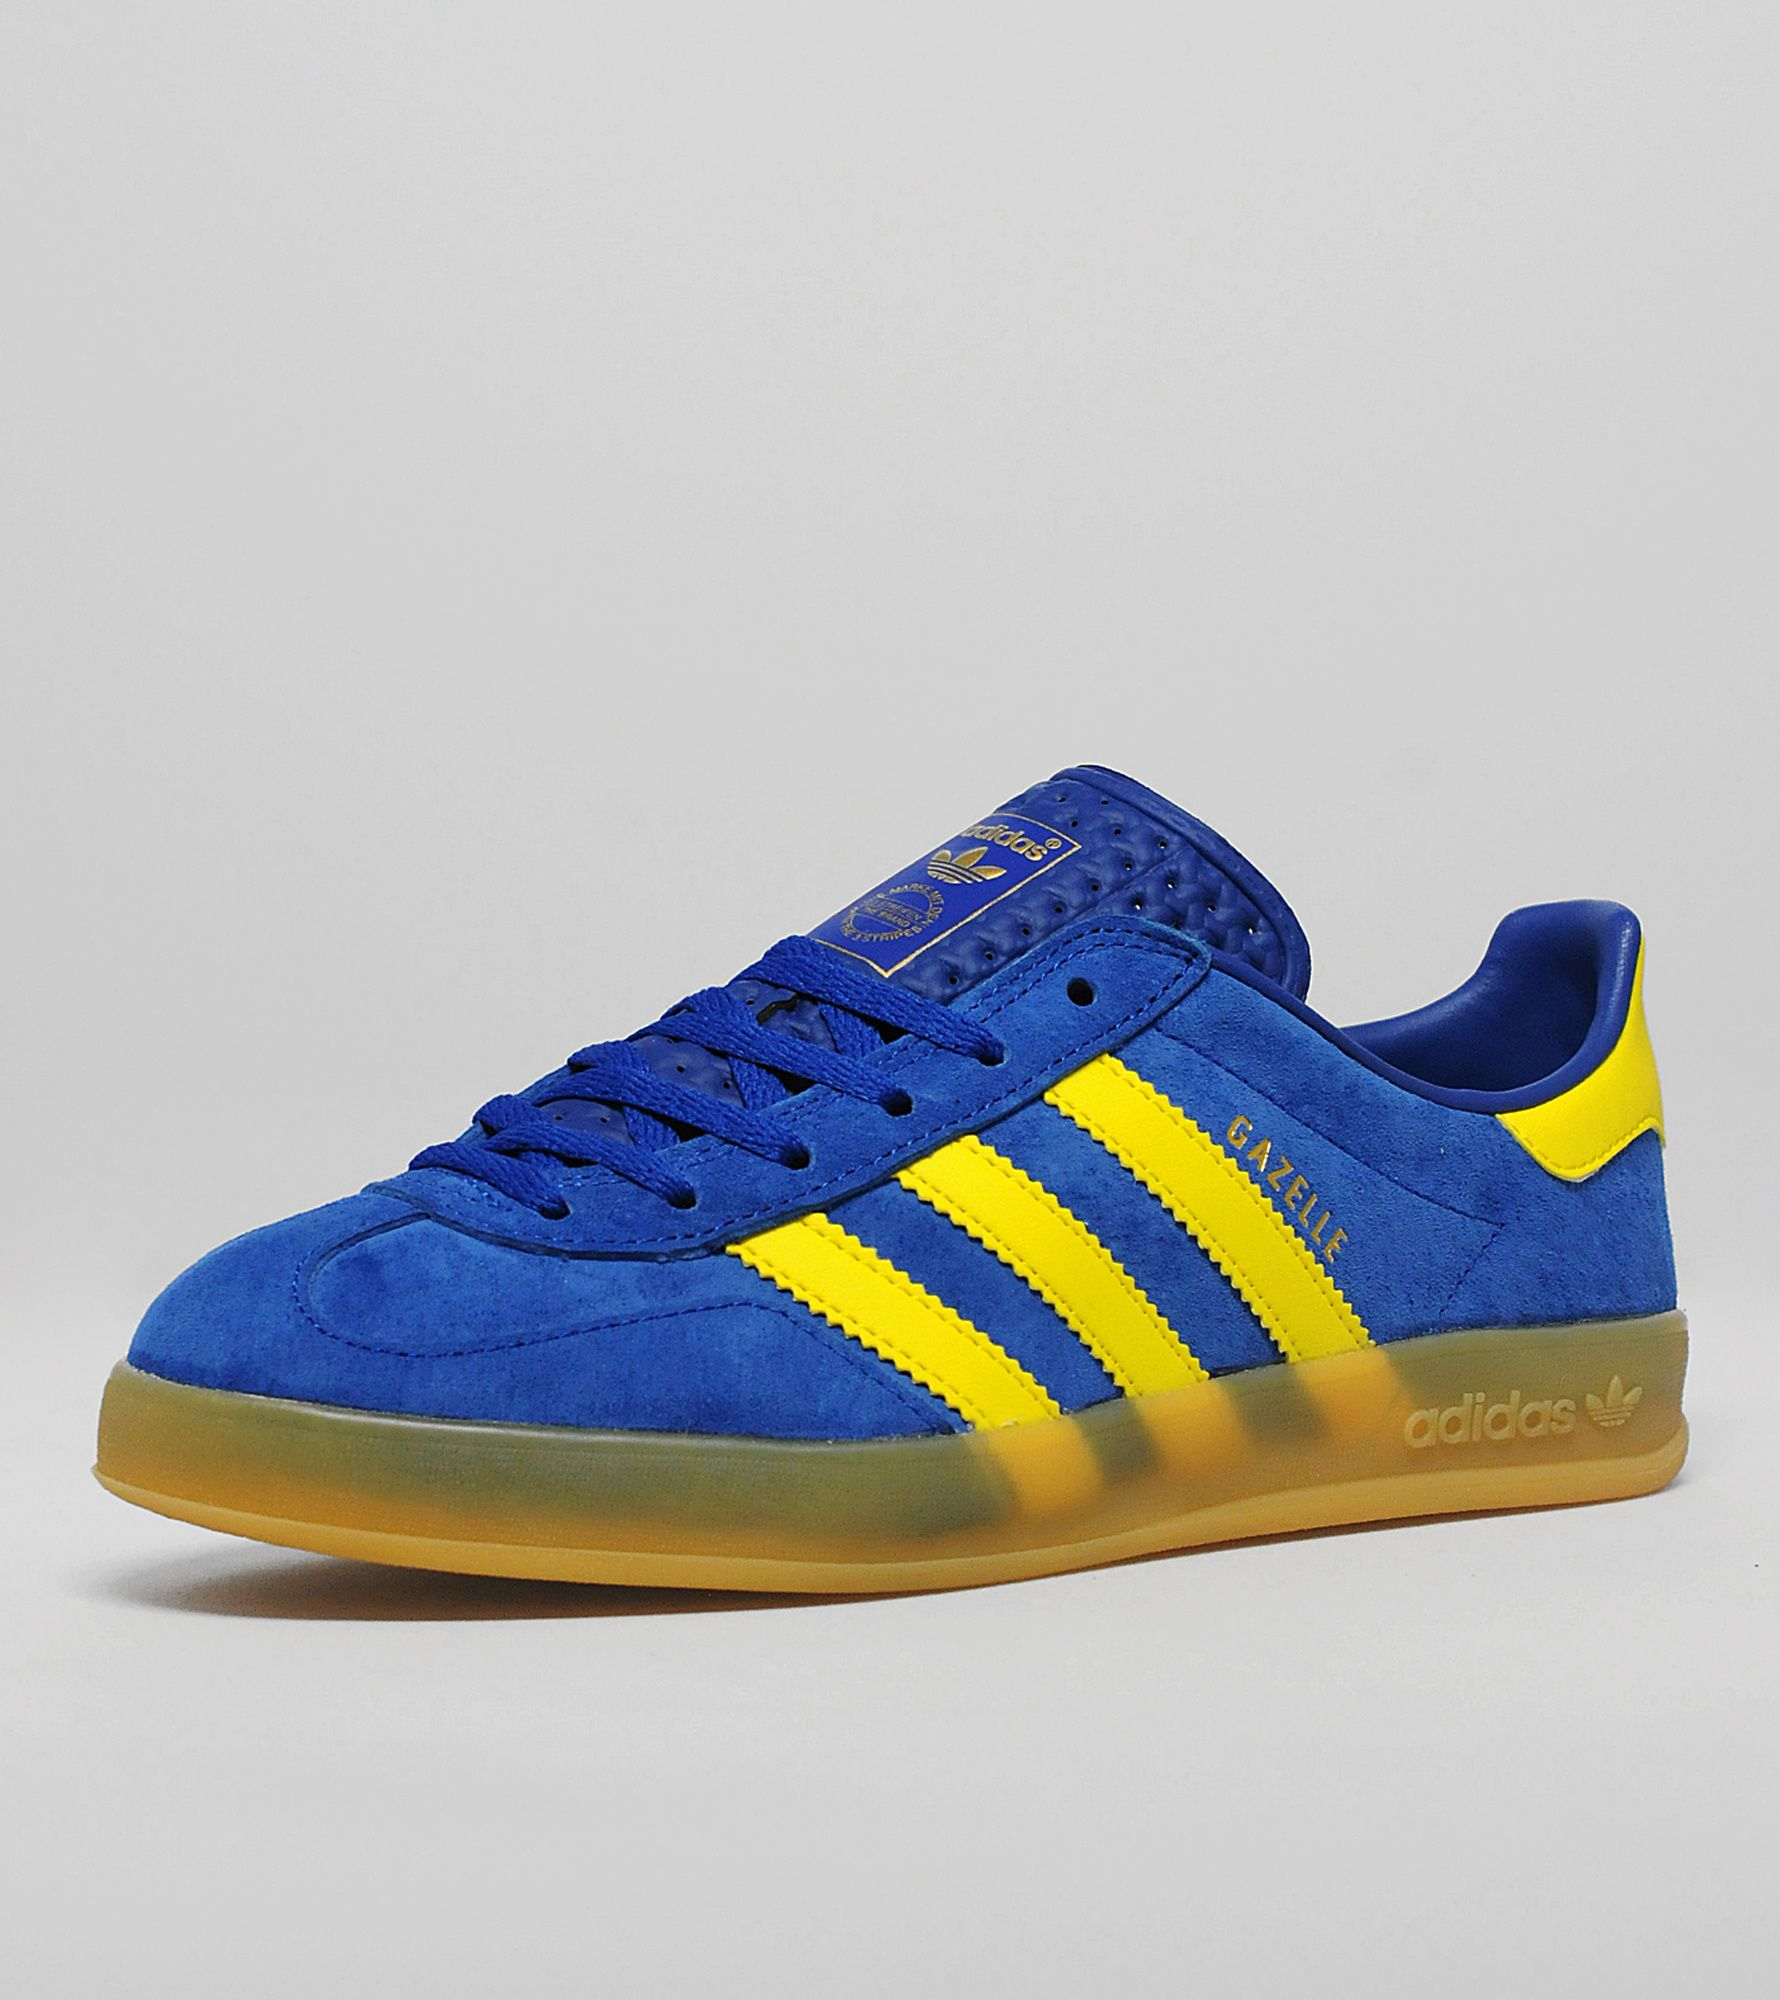 Adidas Gazelle Indoor Blue And Yellow